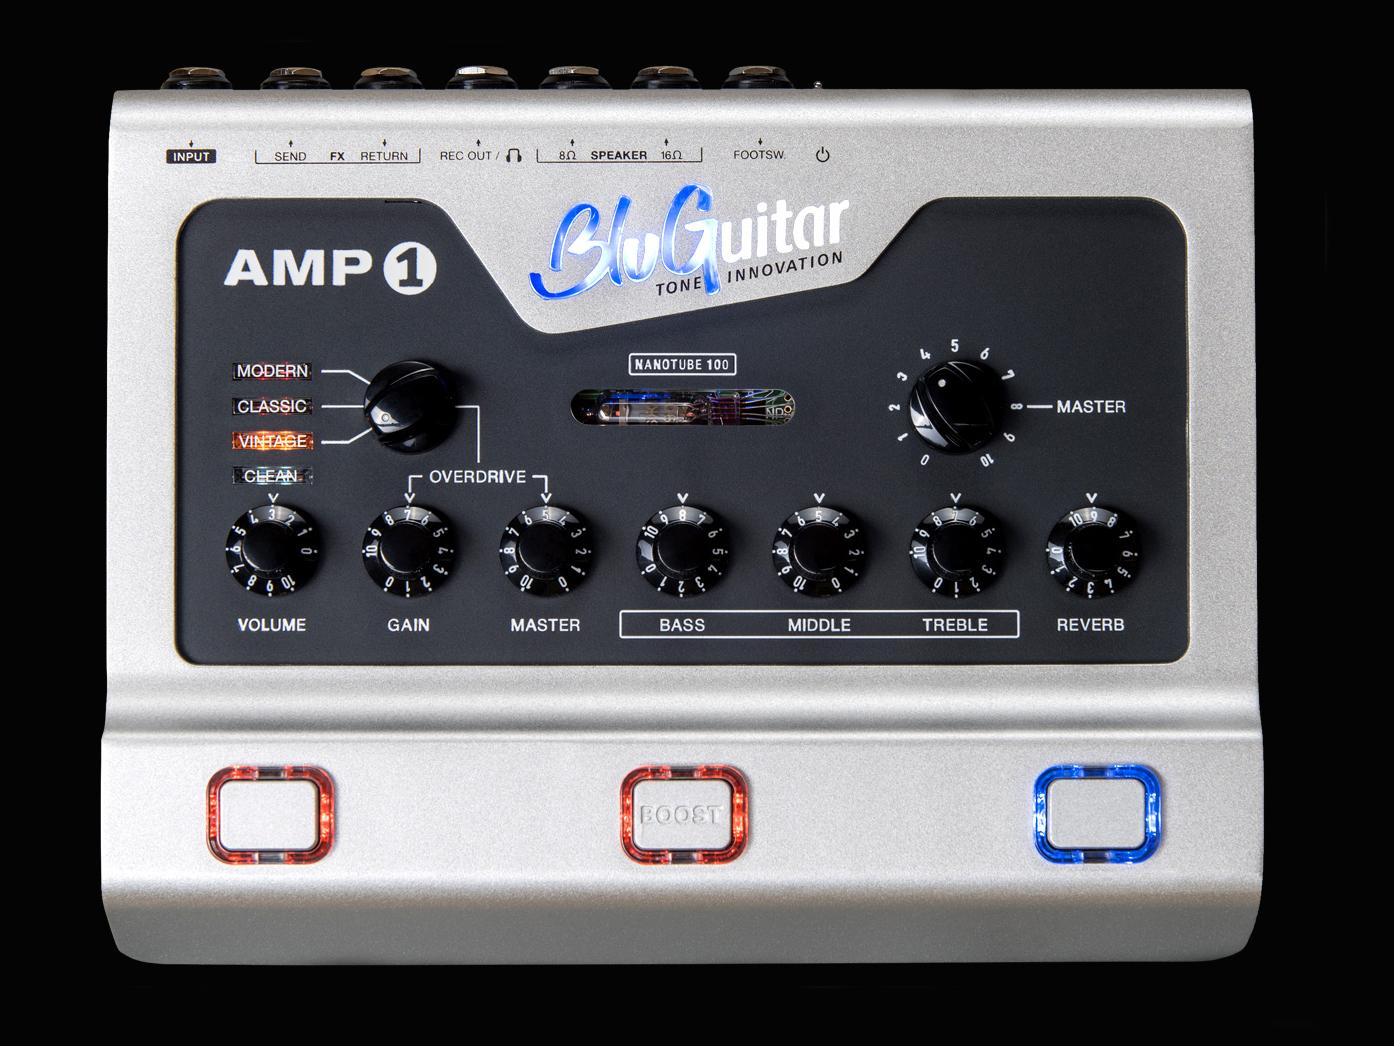 BluGuitar upgrades its popular AMP1 pedal